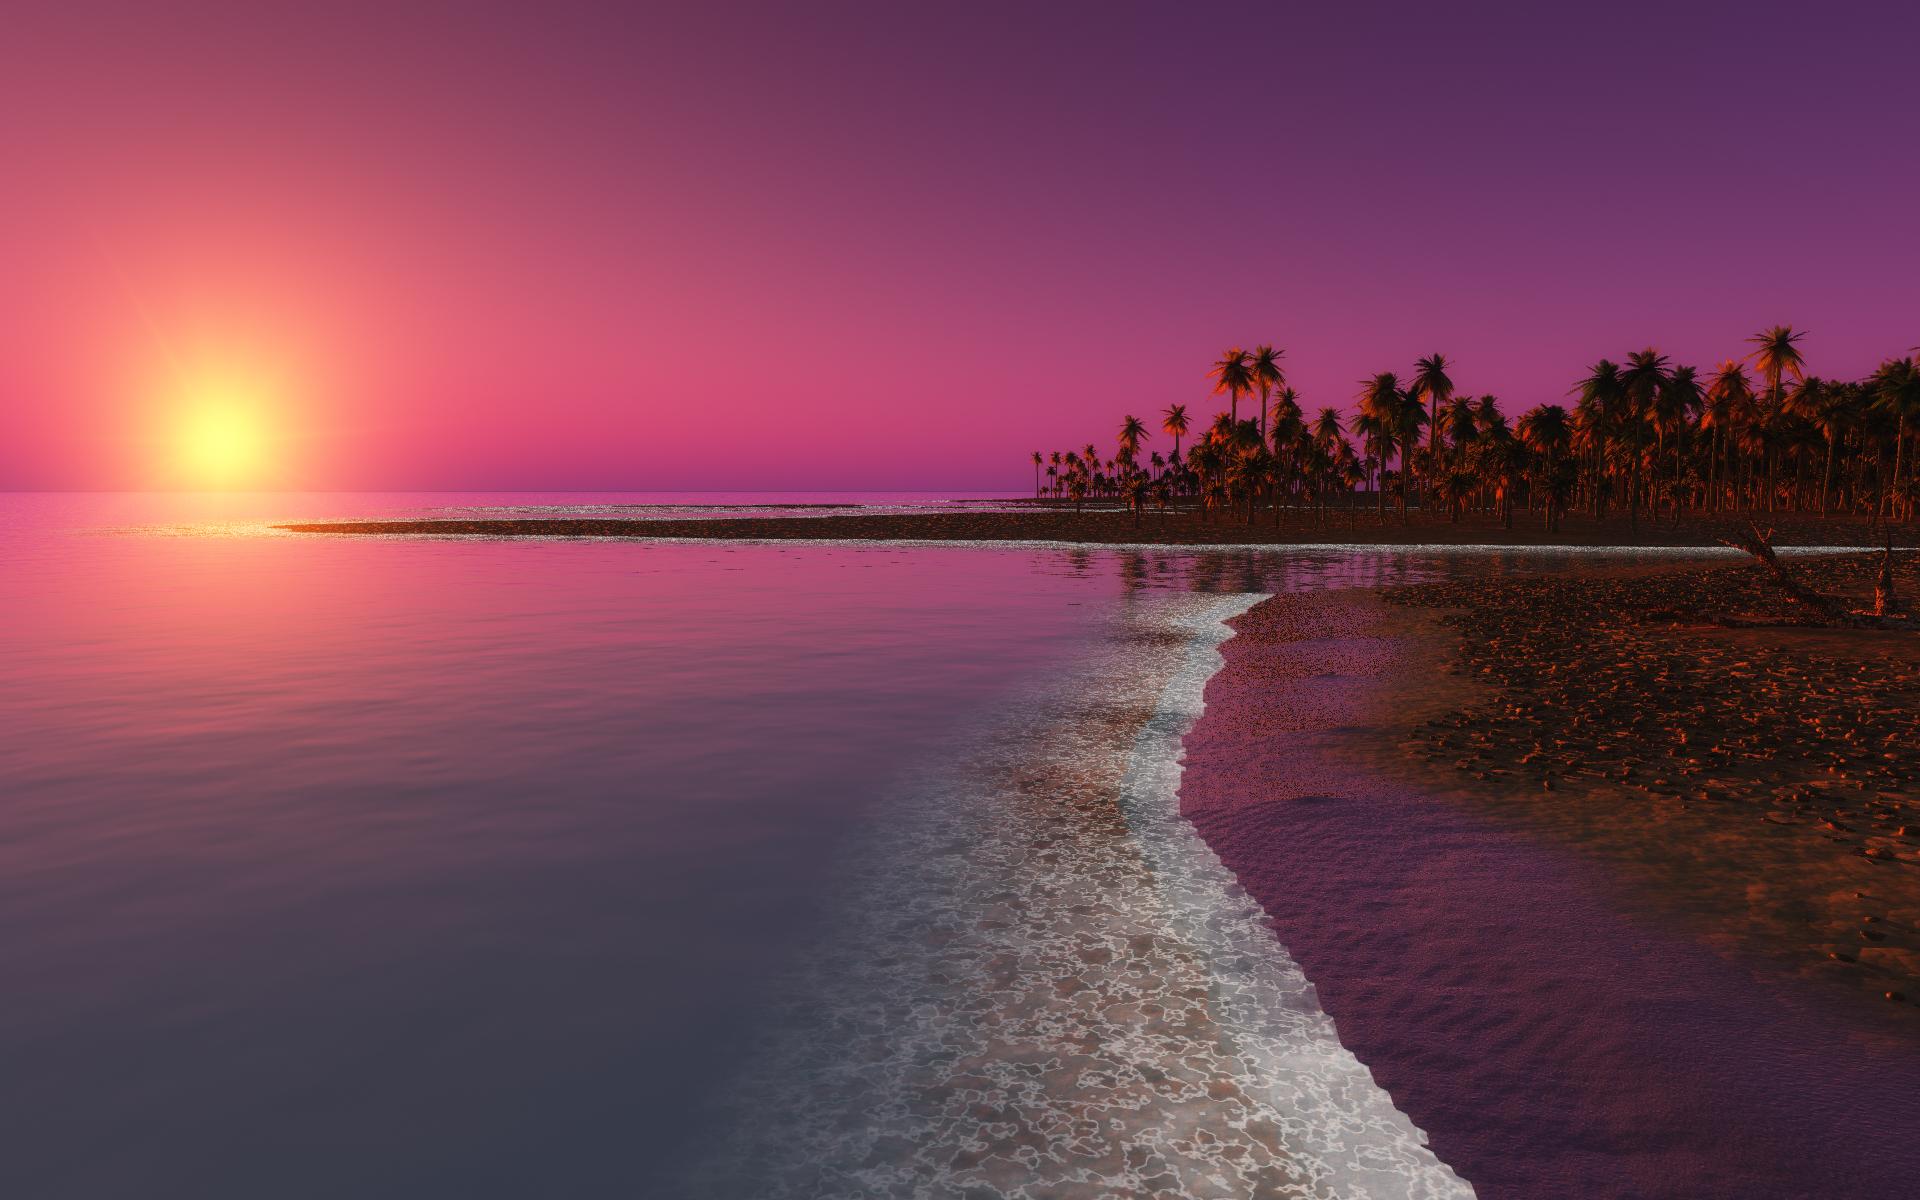 Pink Landscape Desktop Backgrounds   Wallpaper High Definition High 1920x1200